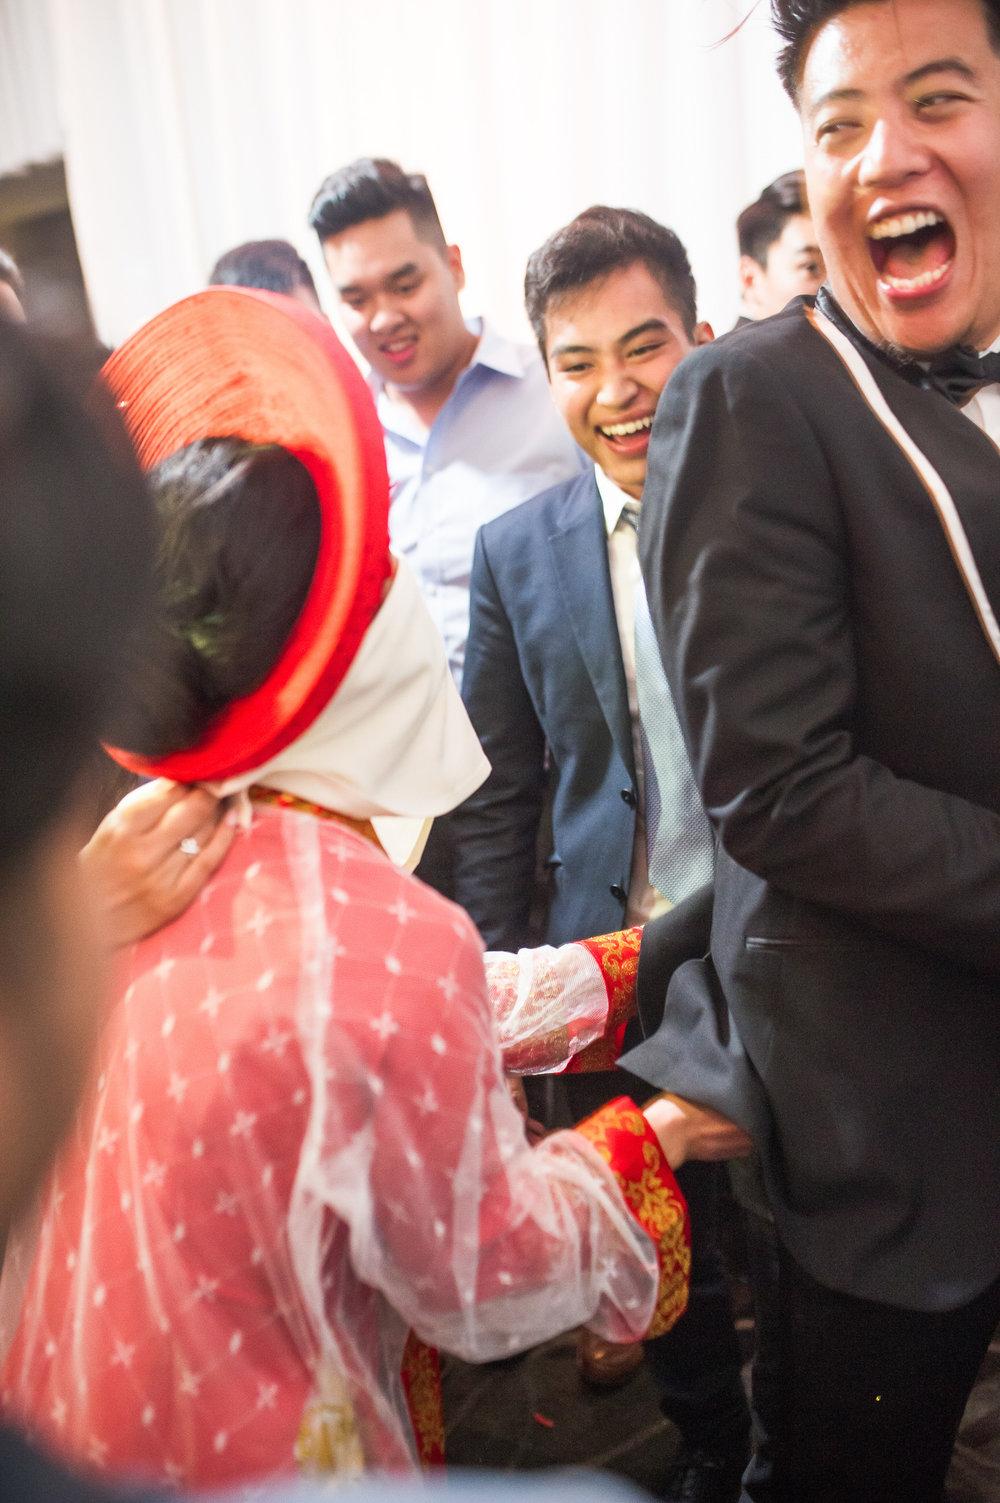 Dream_Wedding_Thanh_Thanh-21705.jpg